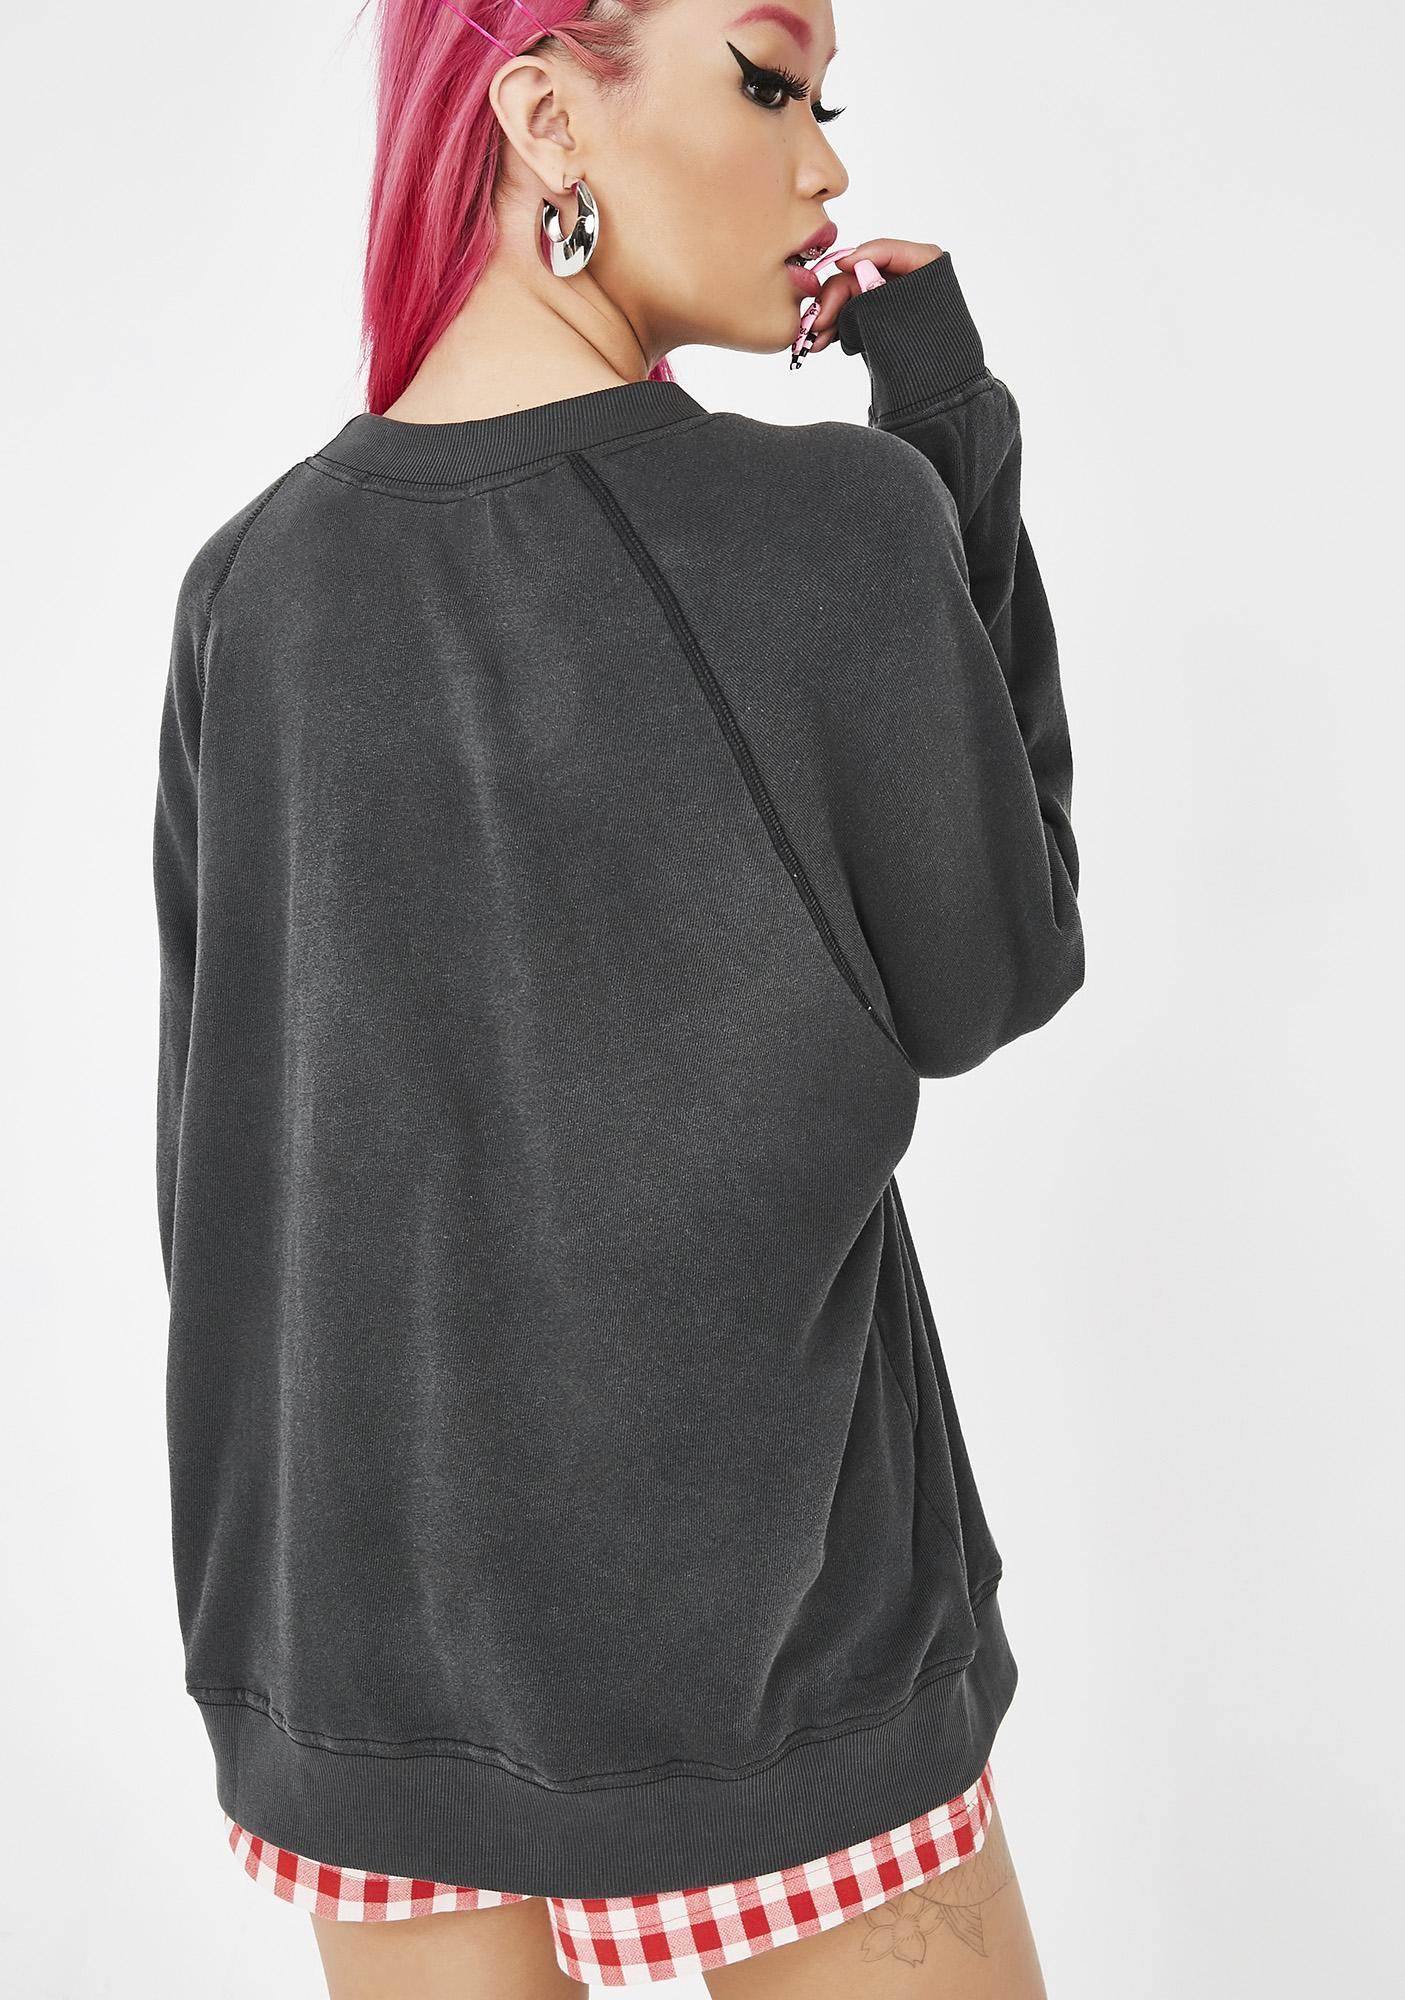 Wildfox Couture Shrooms Crewneck Sweatshirt